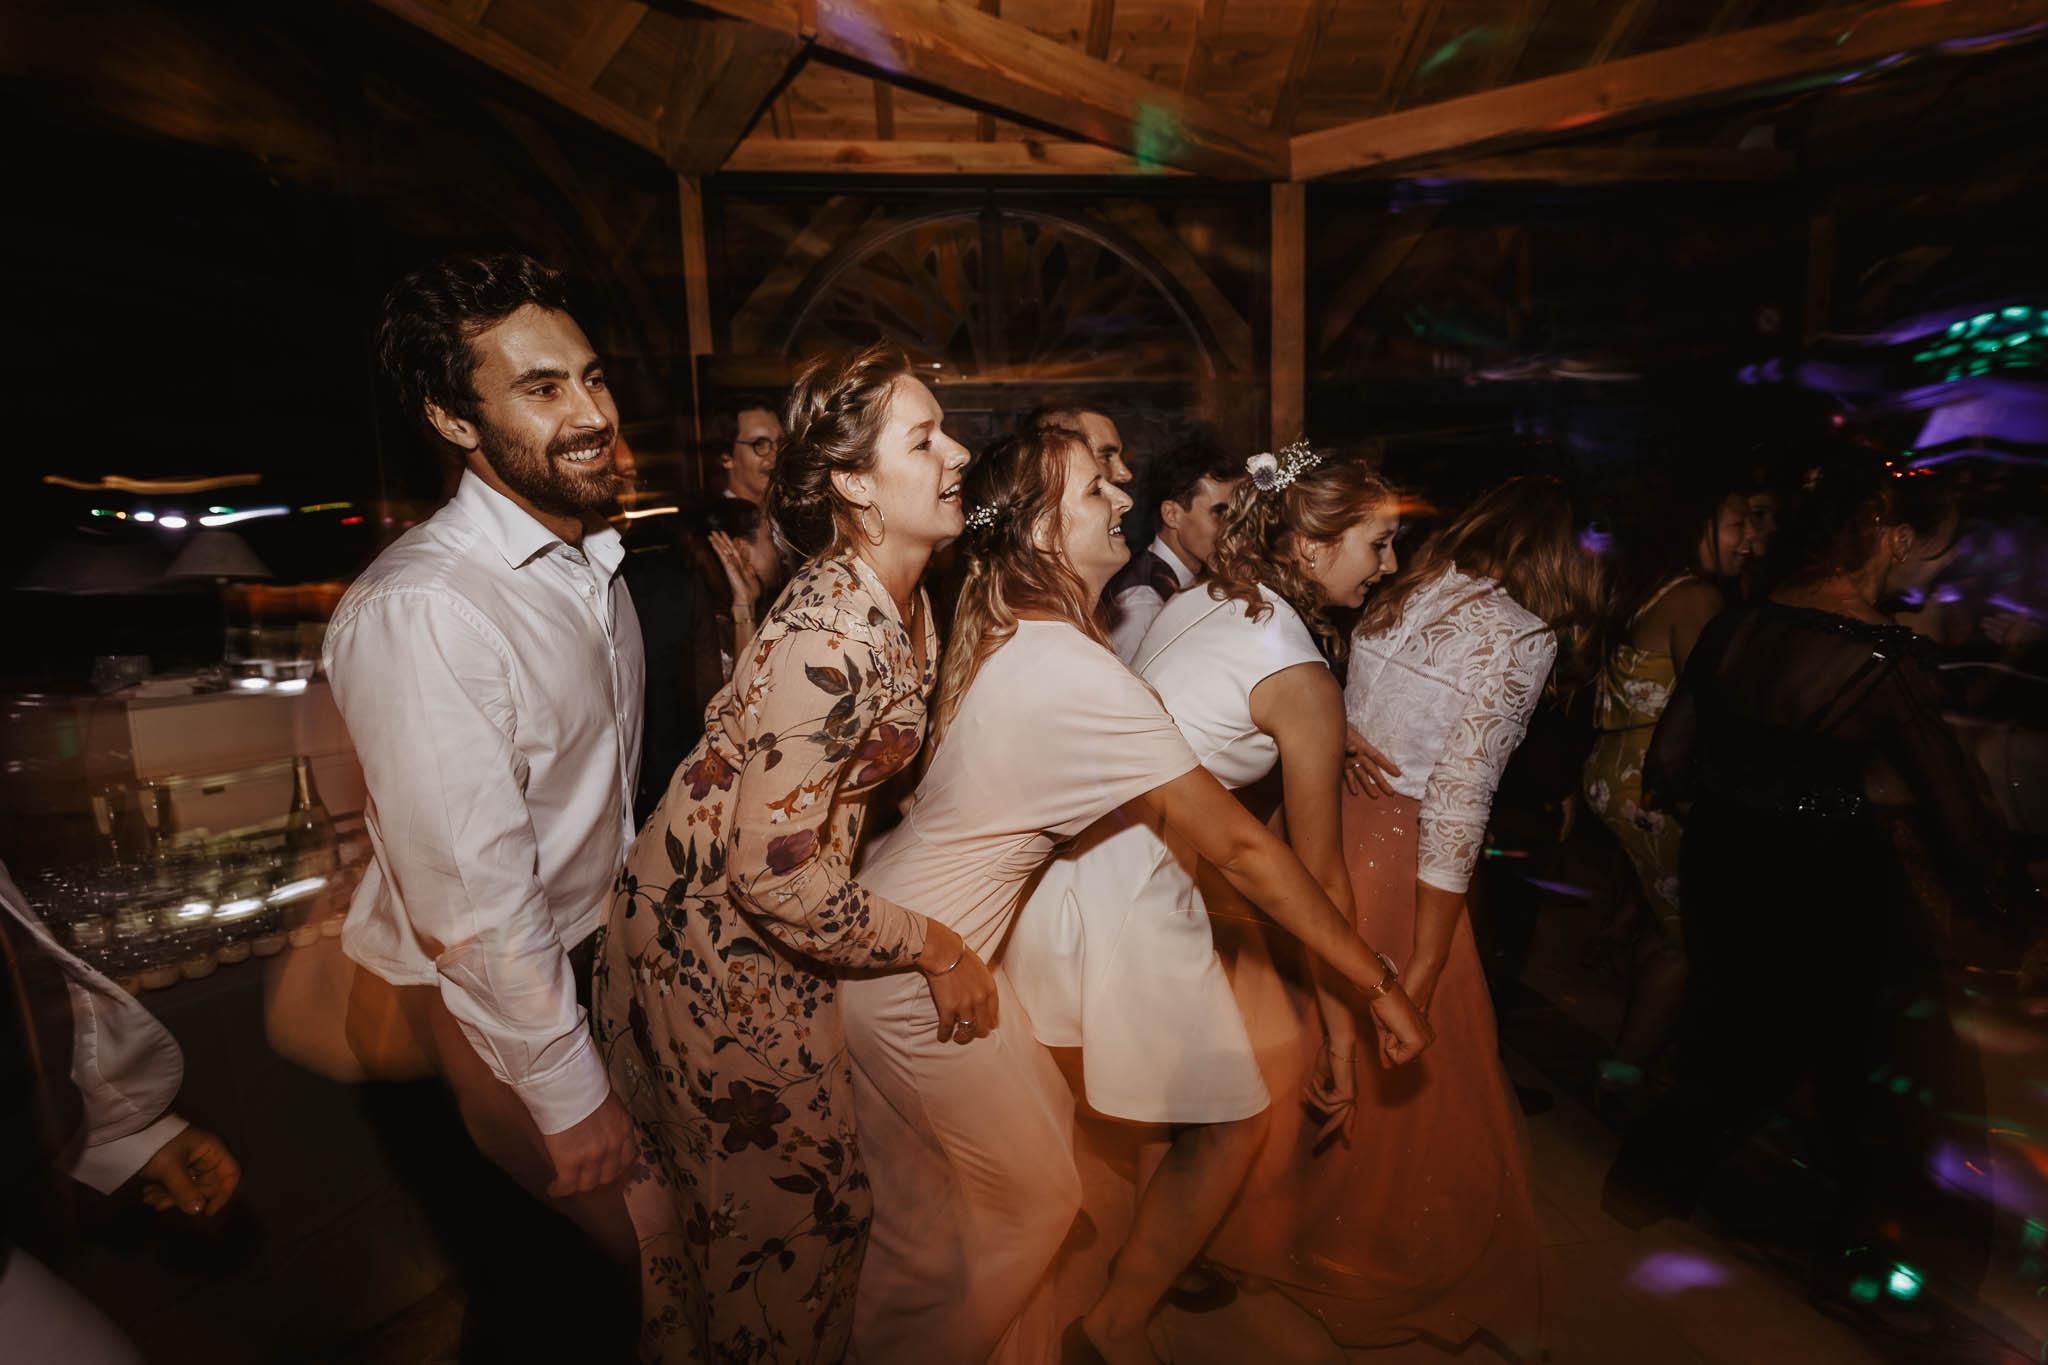 mariage-beaujolais-verbust-ingold-18.jpg